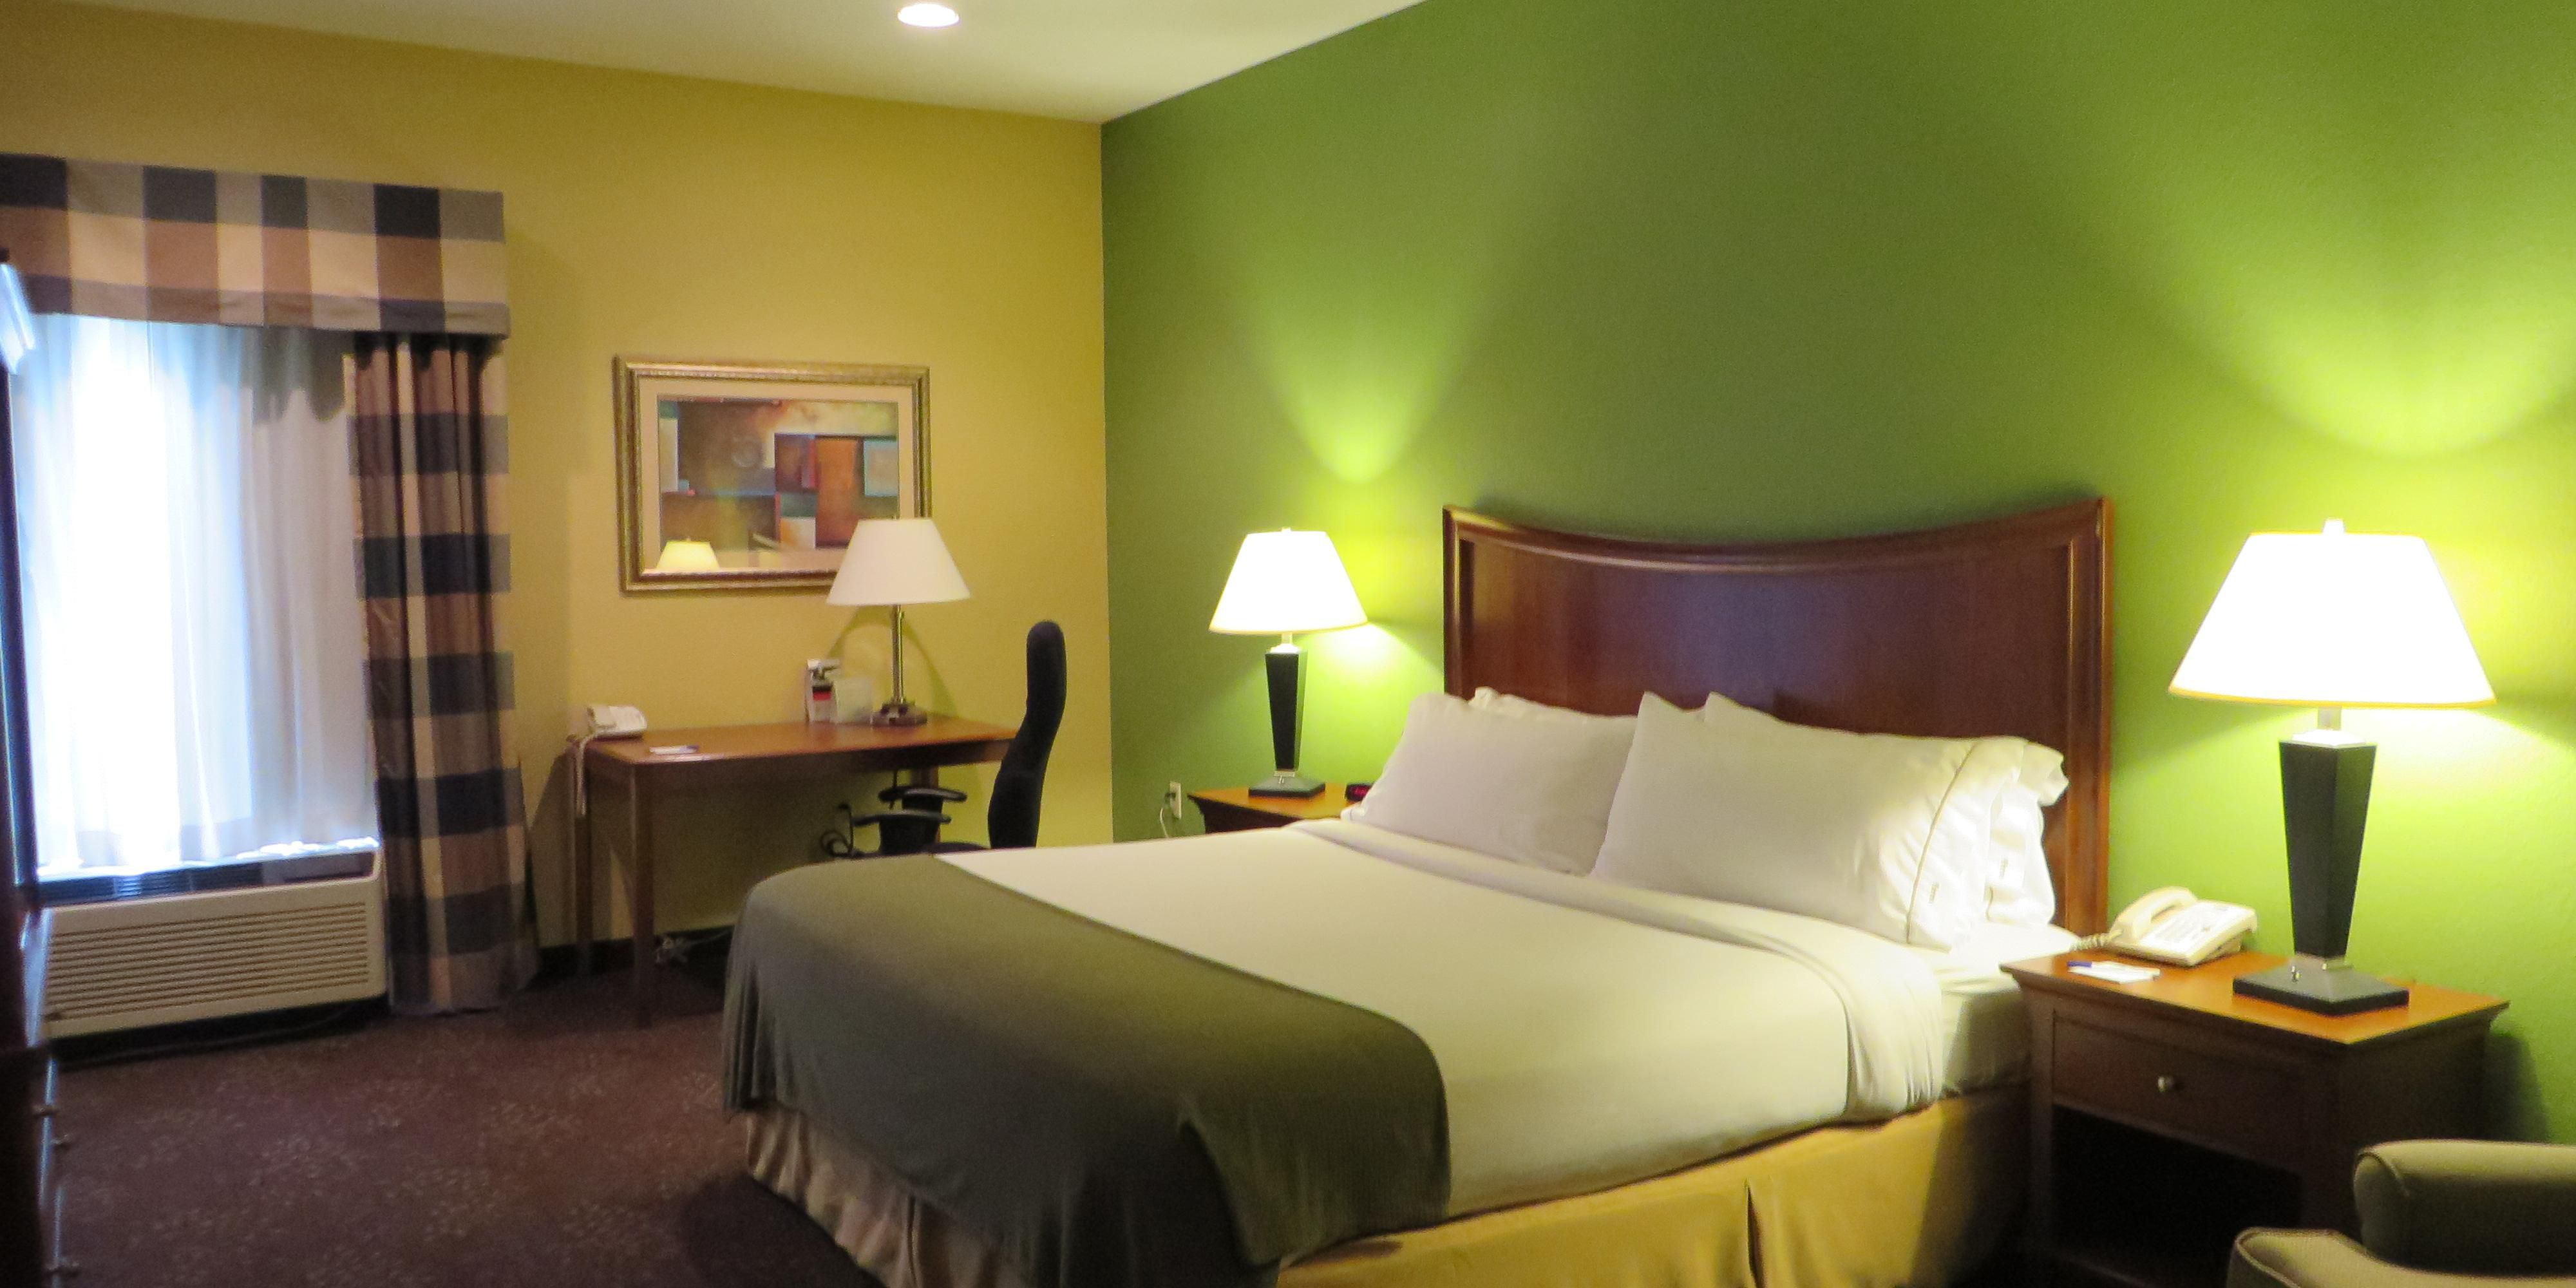 Holiday Inn Express Warrensburg 2532965106 2x1